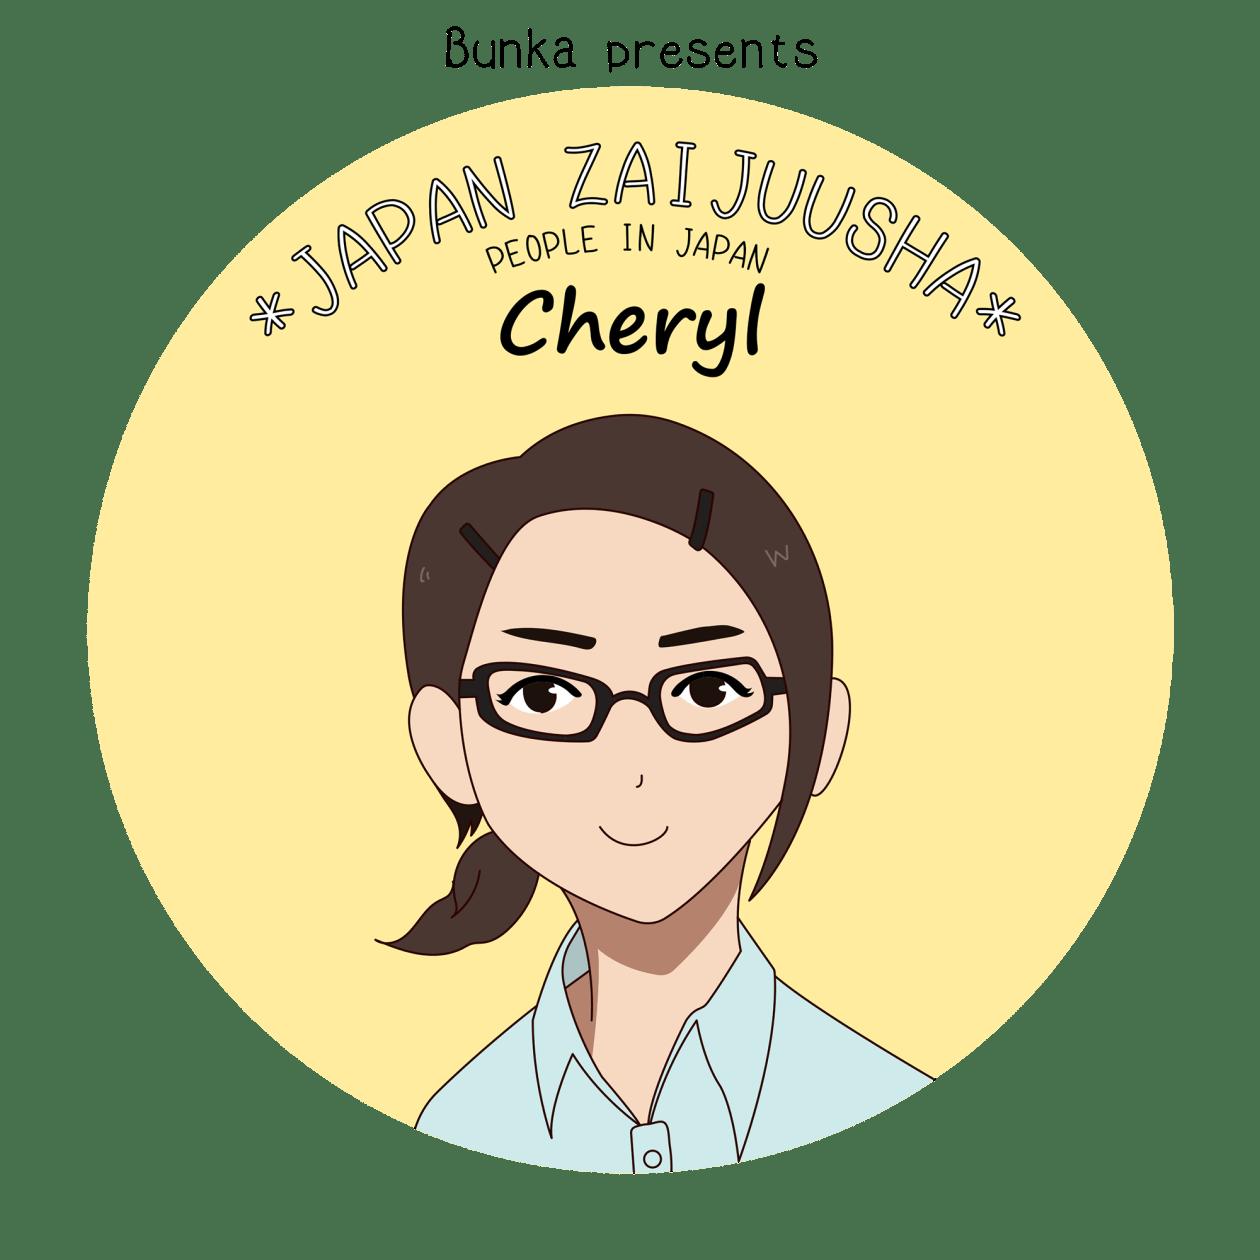 Cheryl Portrait